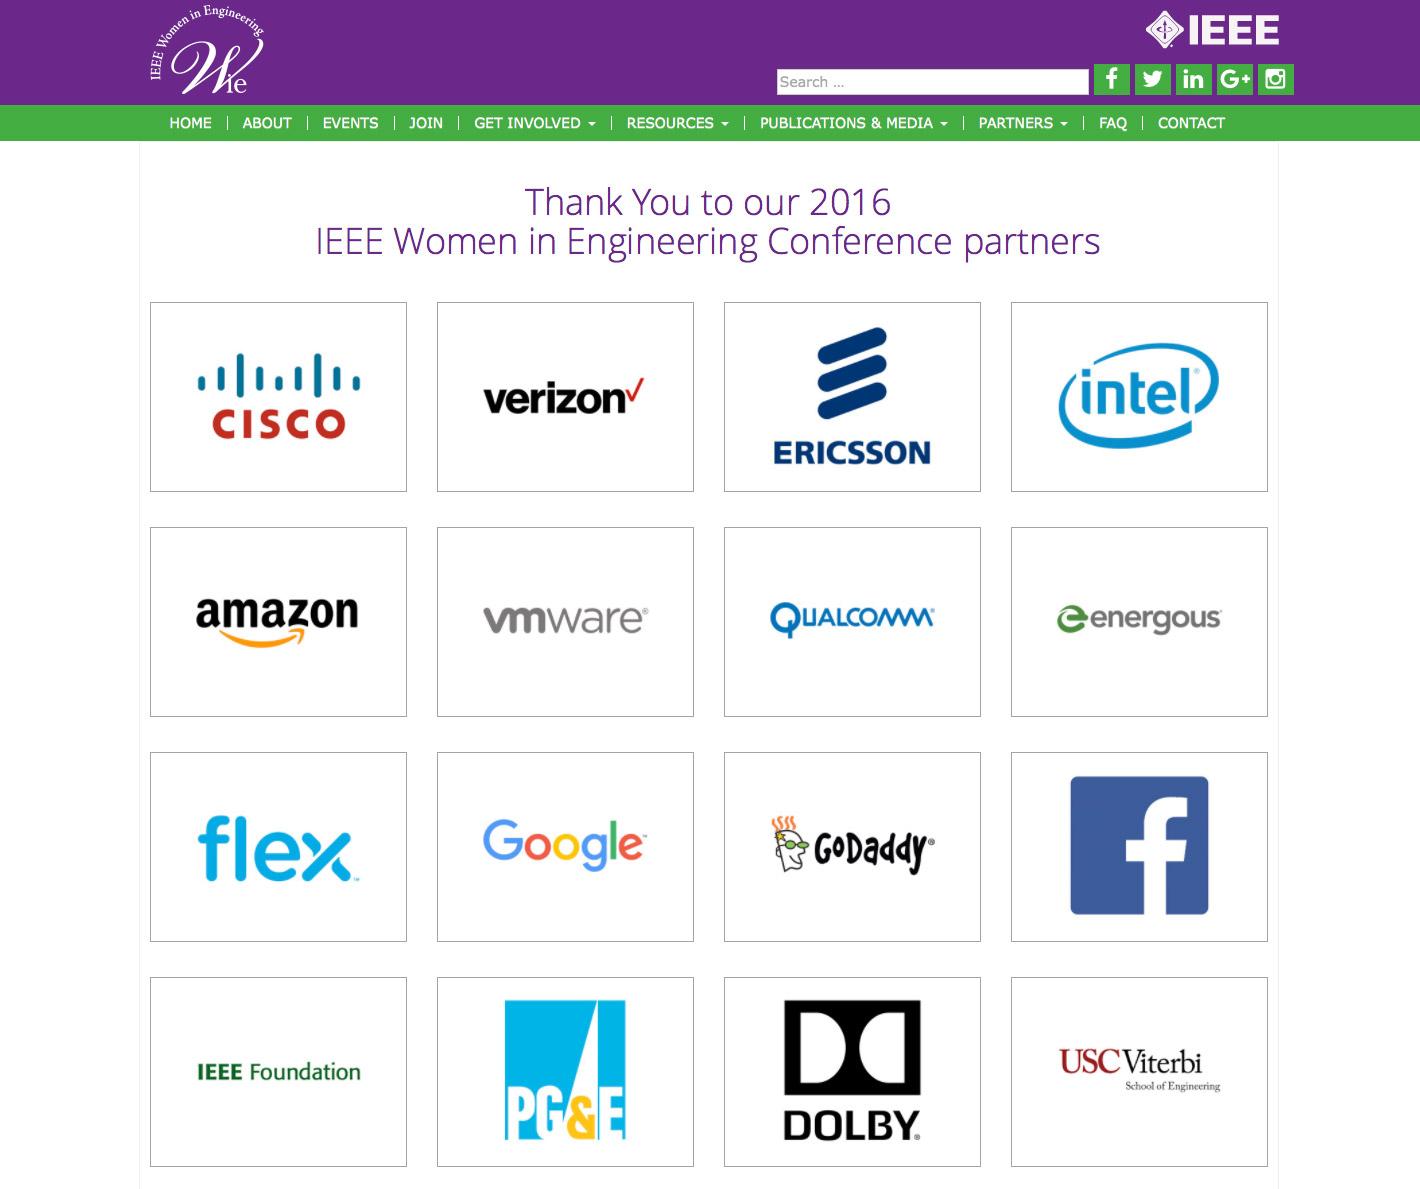 IEEE-wie-partners